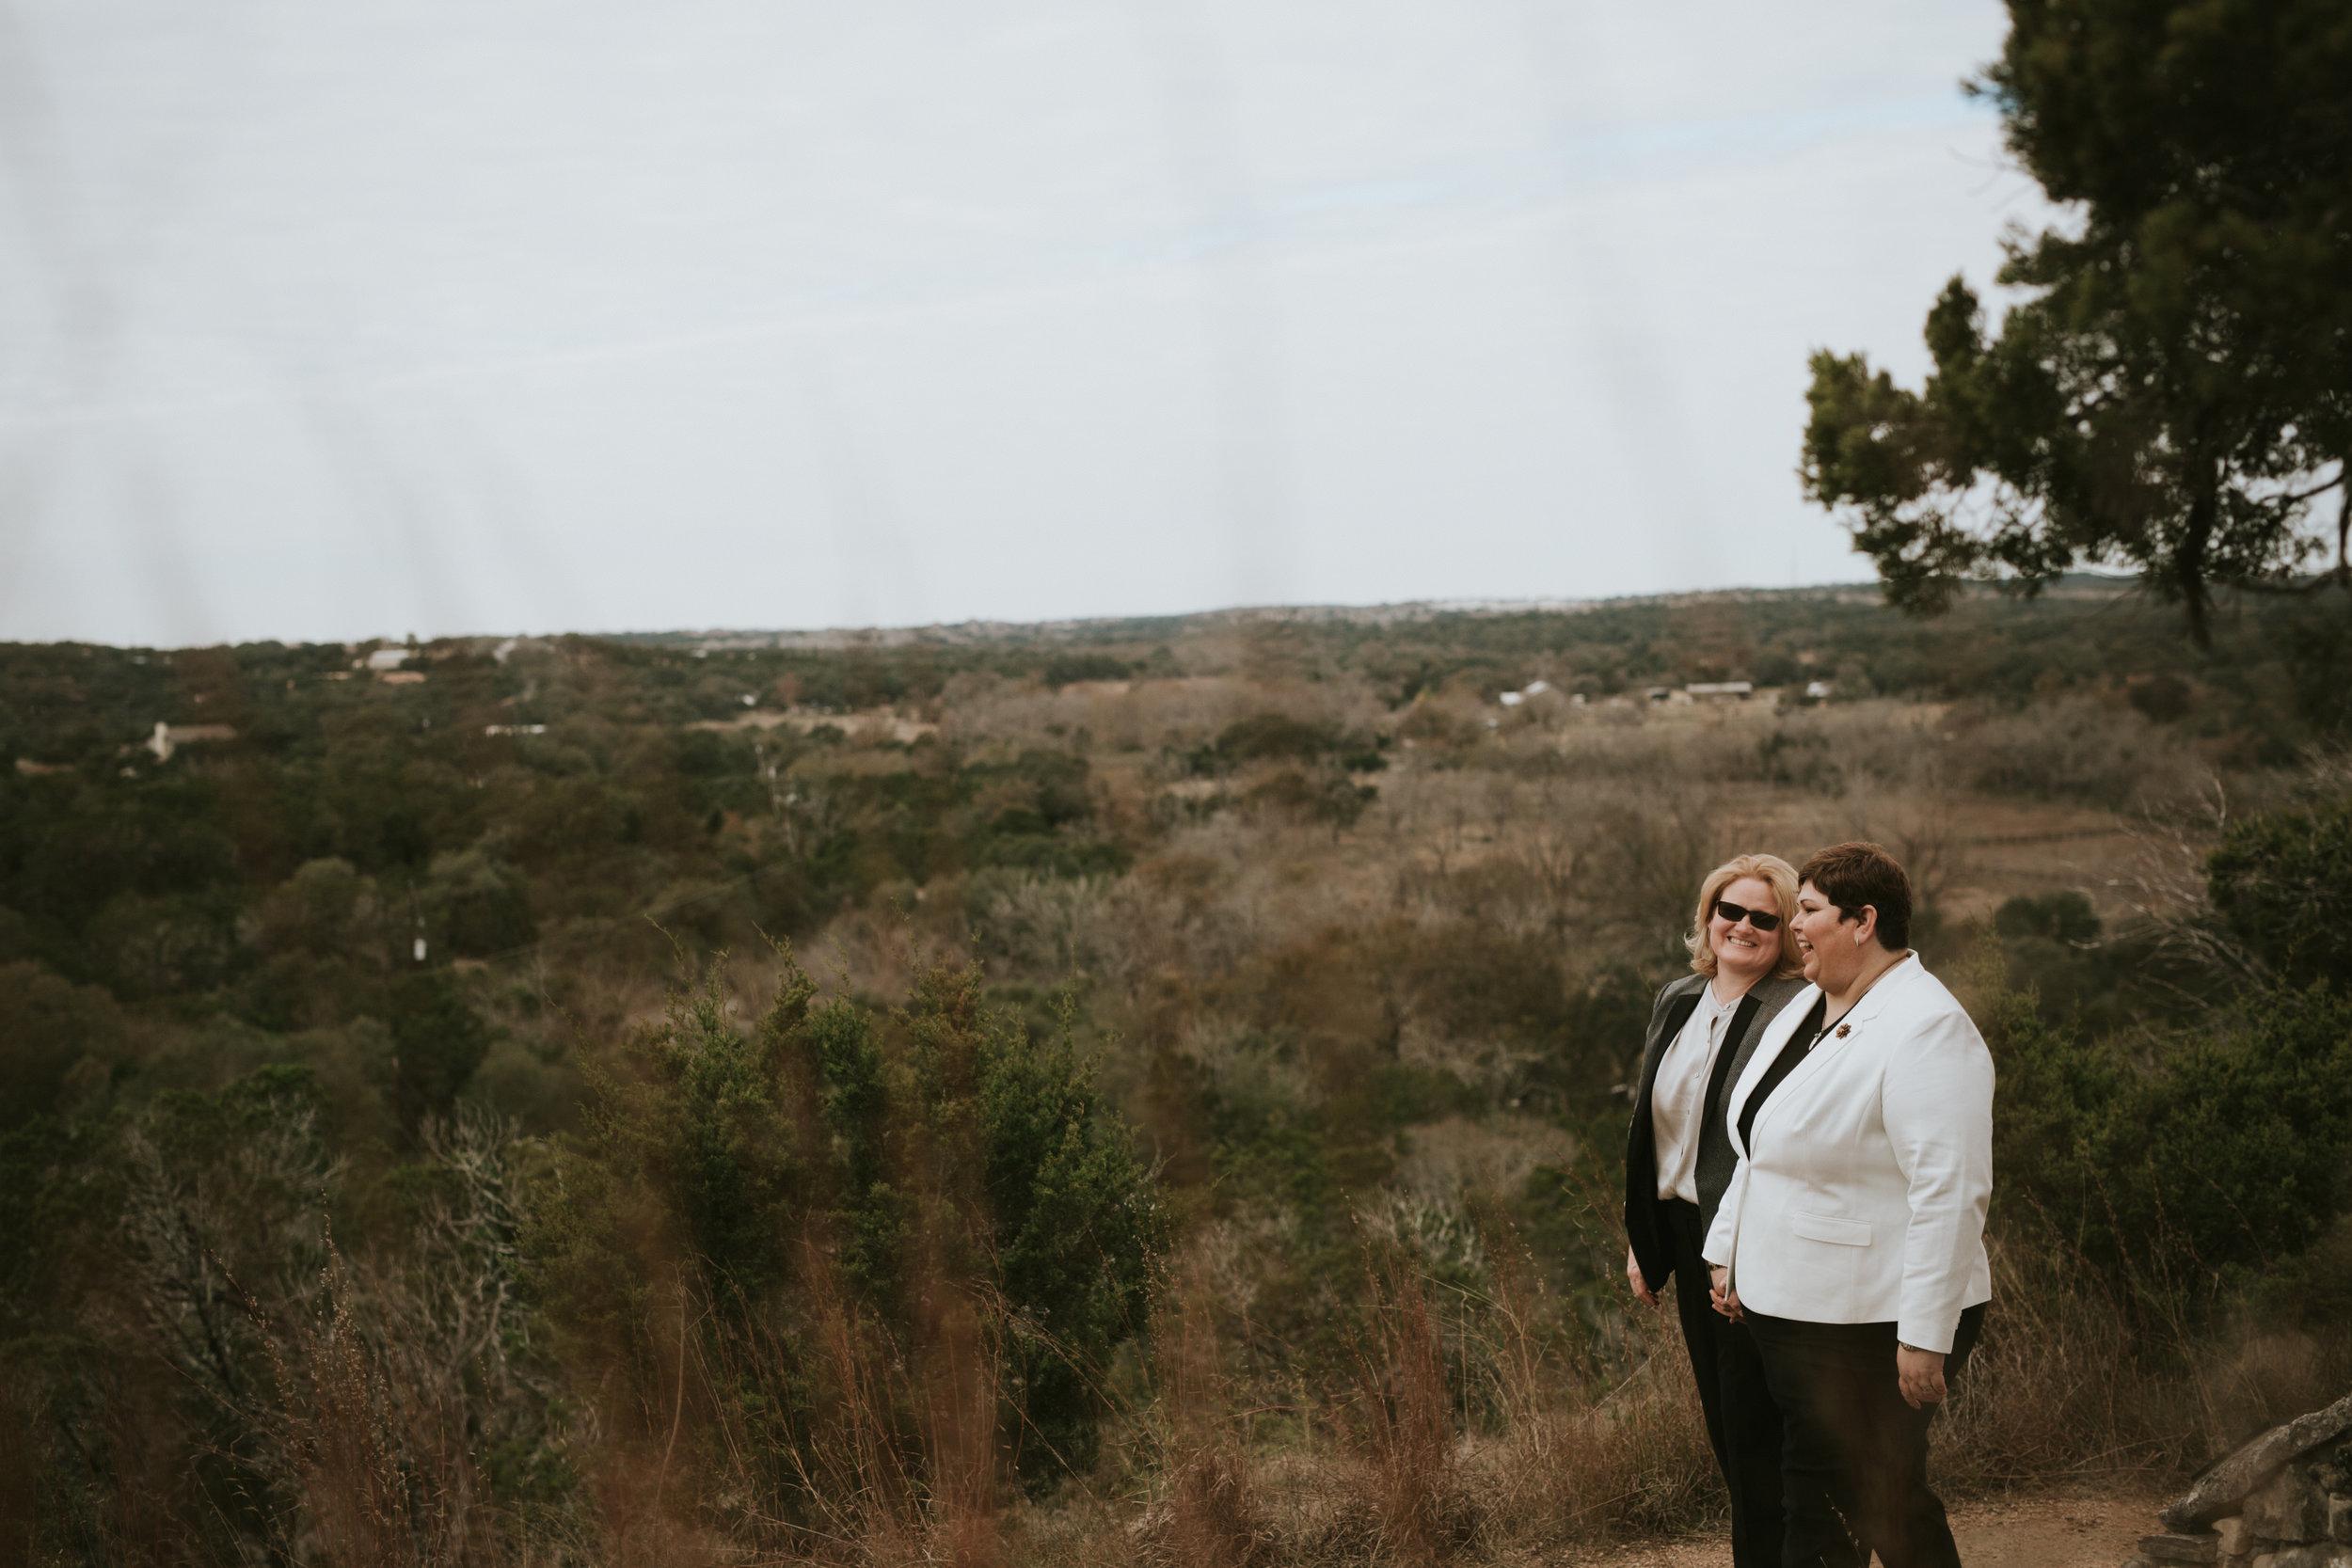 Mari and Johanna Wedding - Diana Ascarrunz Photography-286.JPG